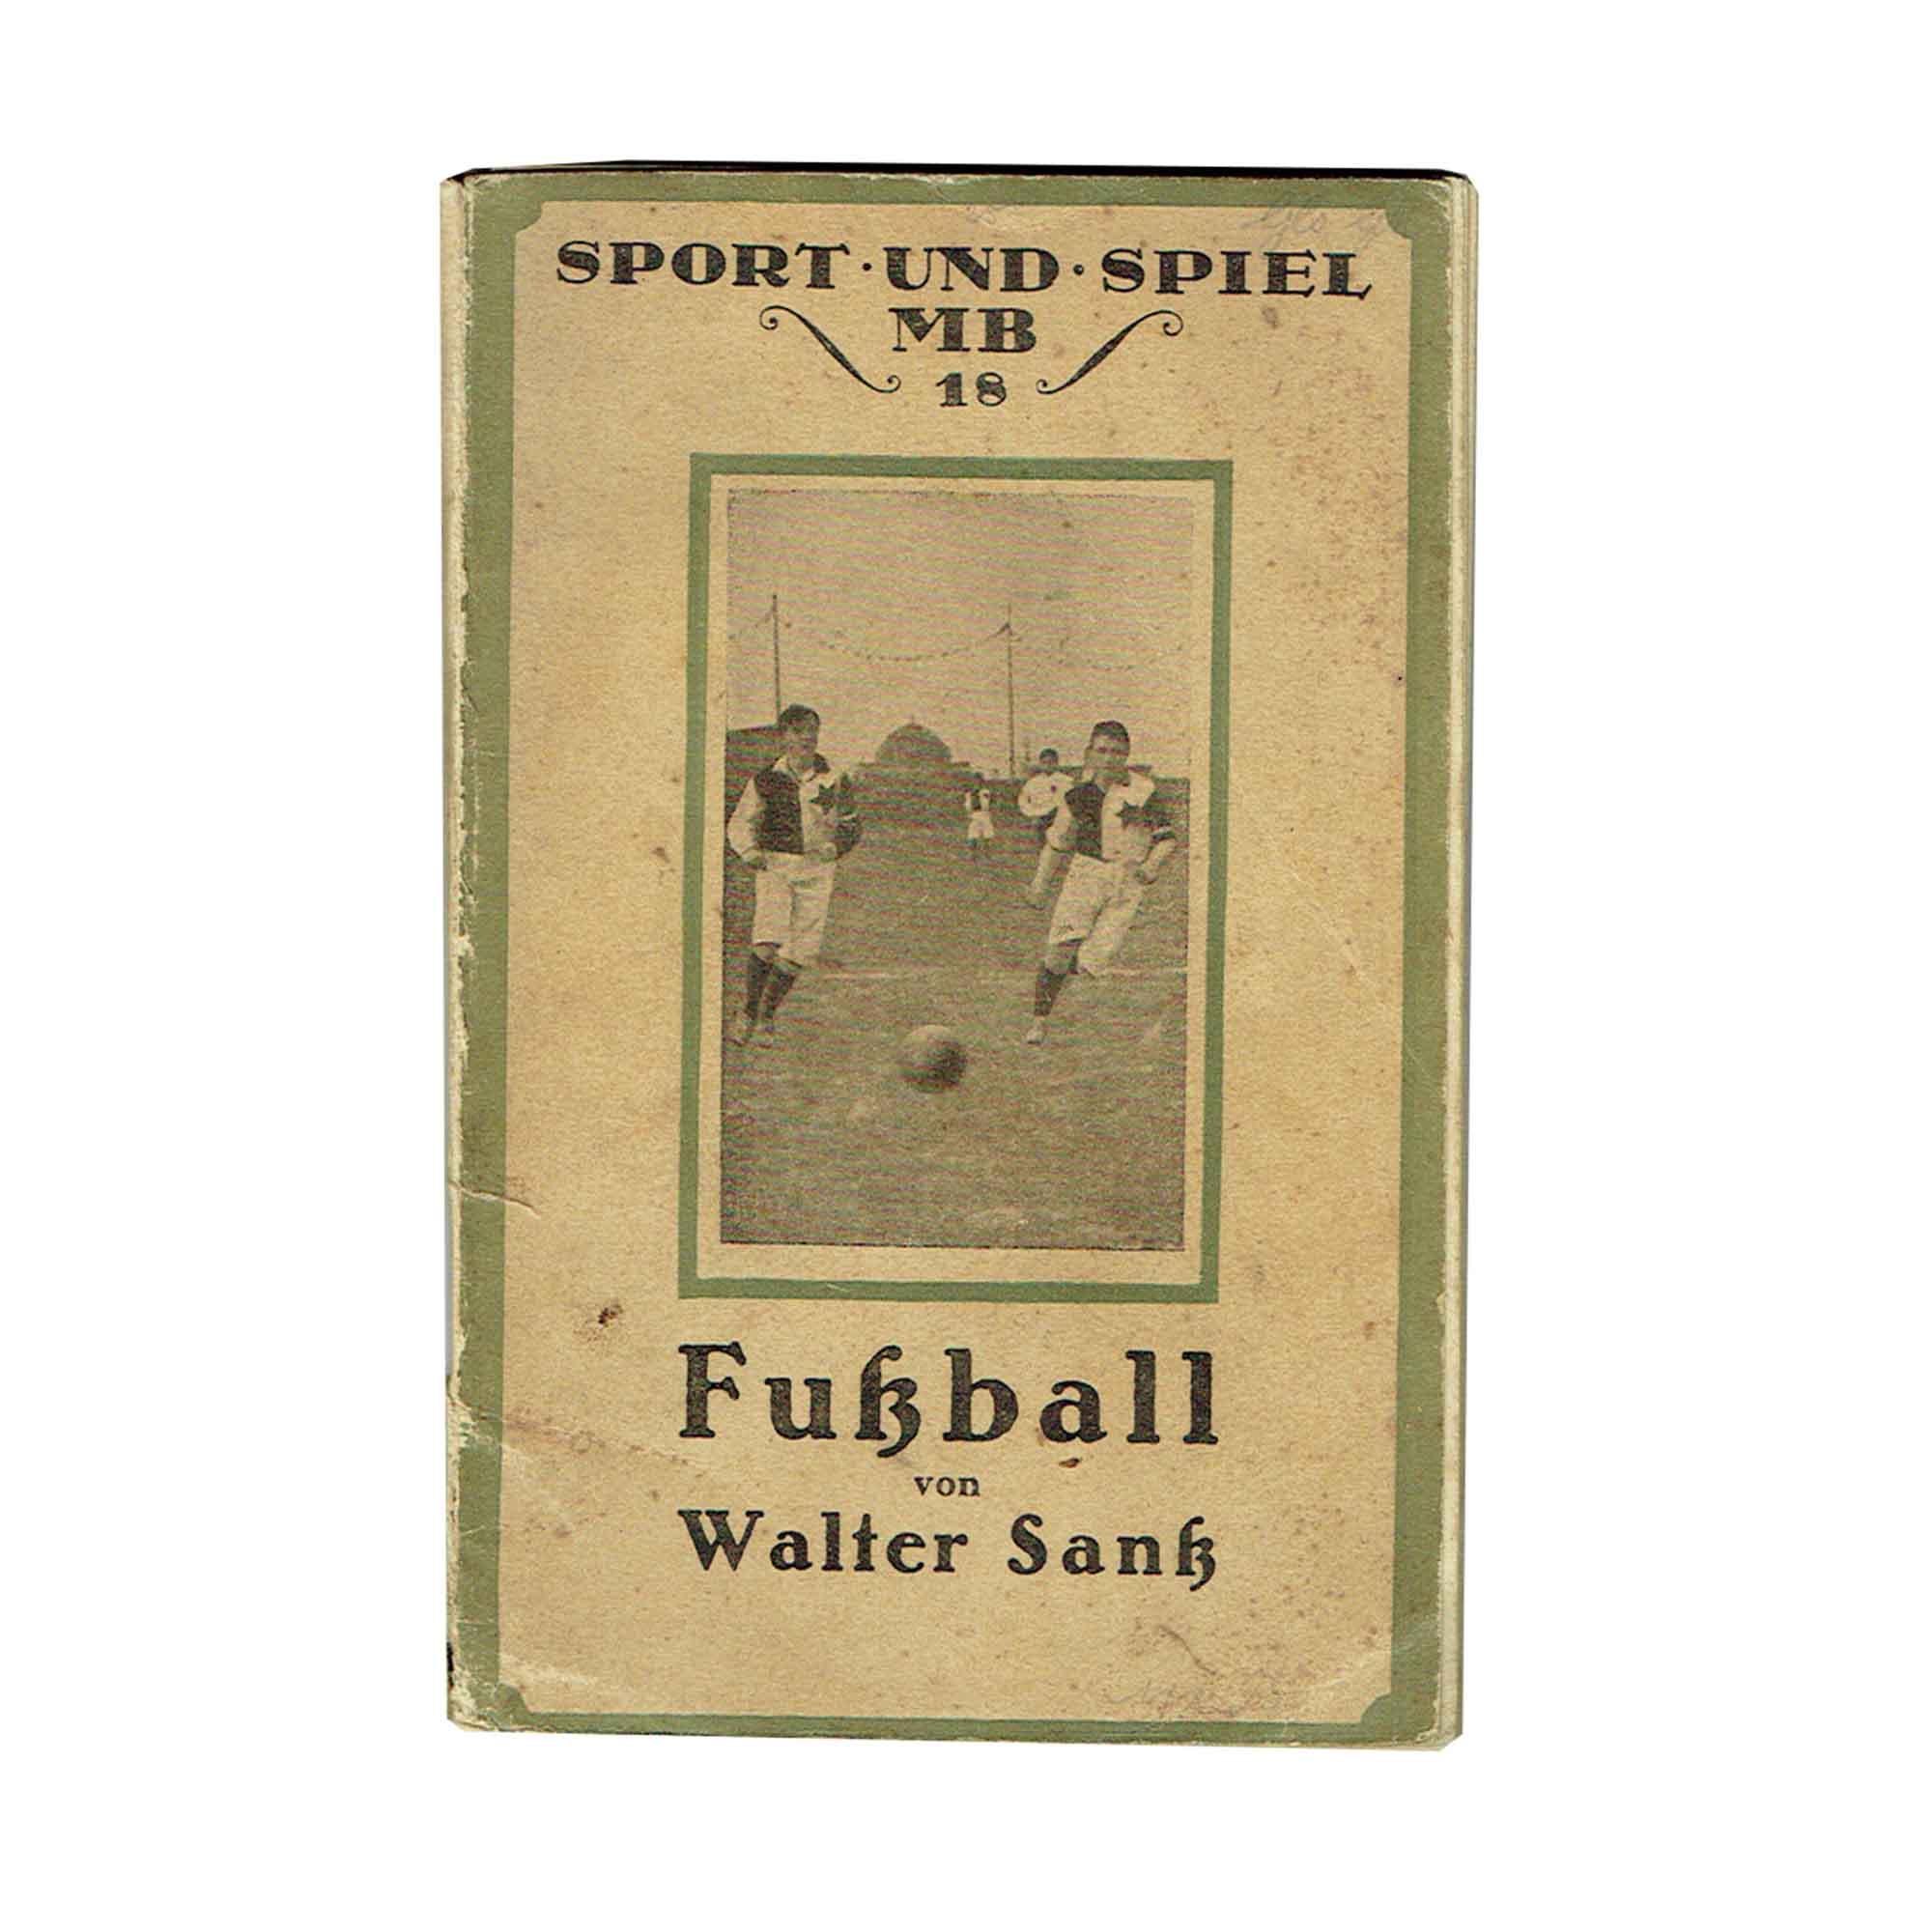 5414-Scharfe-Sanss-Fussball-1920-Umschlag-frei-N.jpg